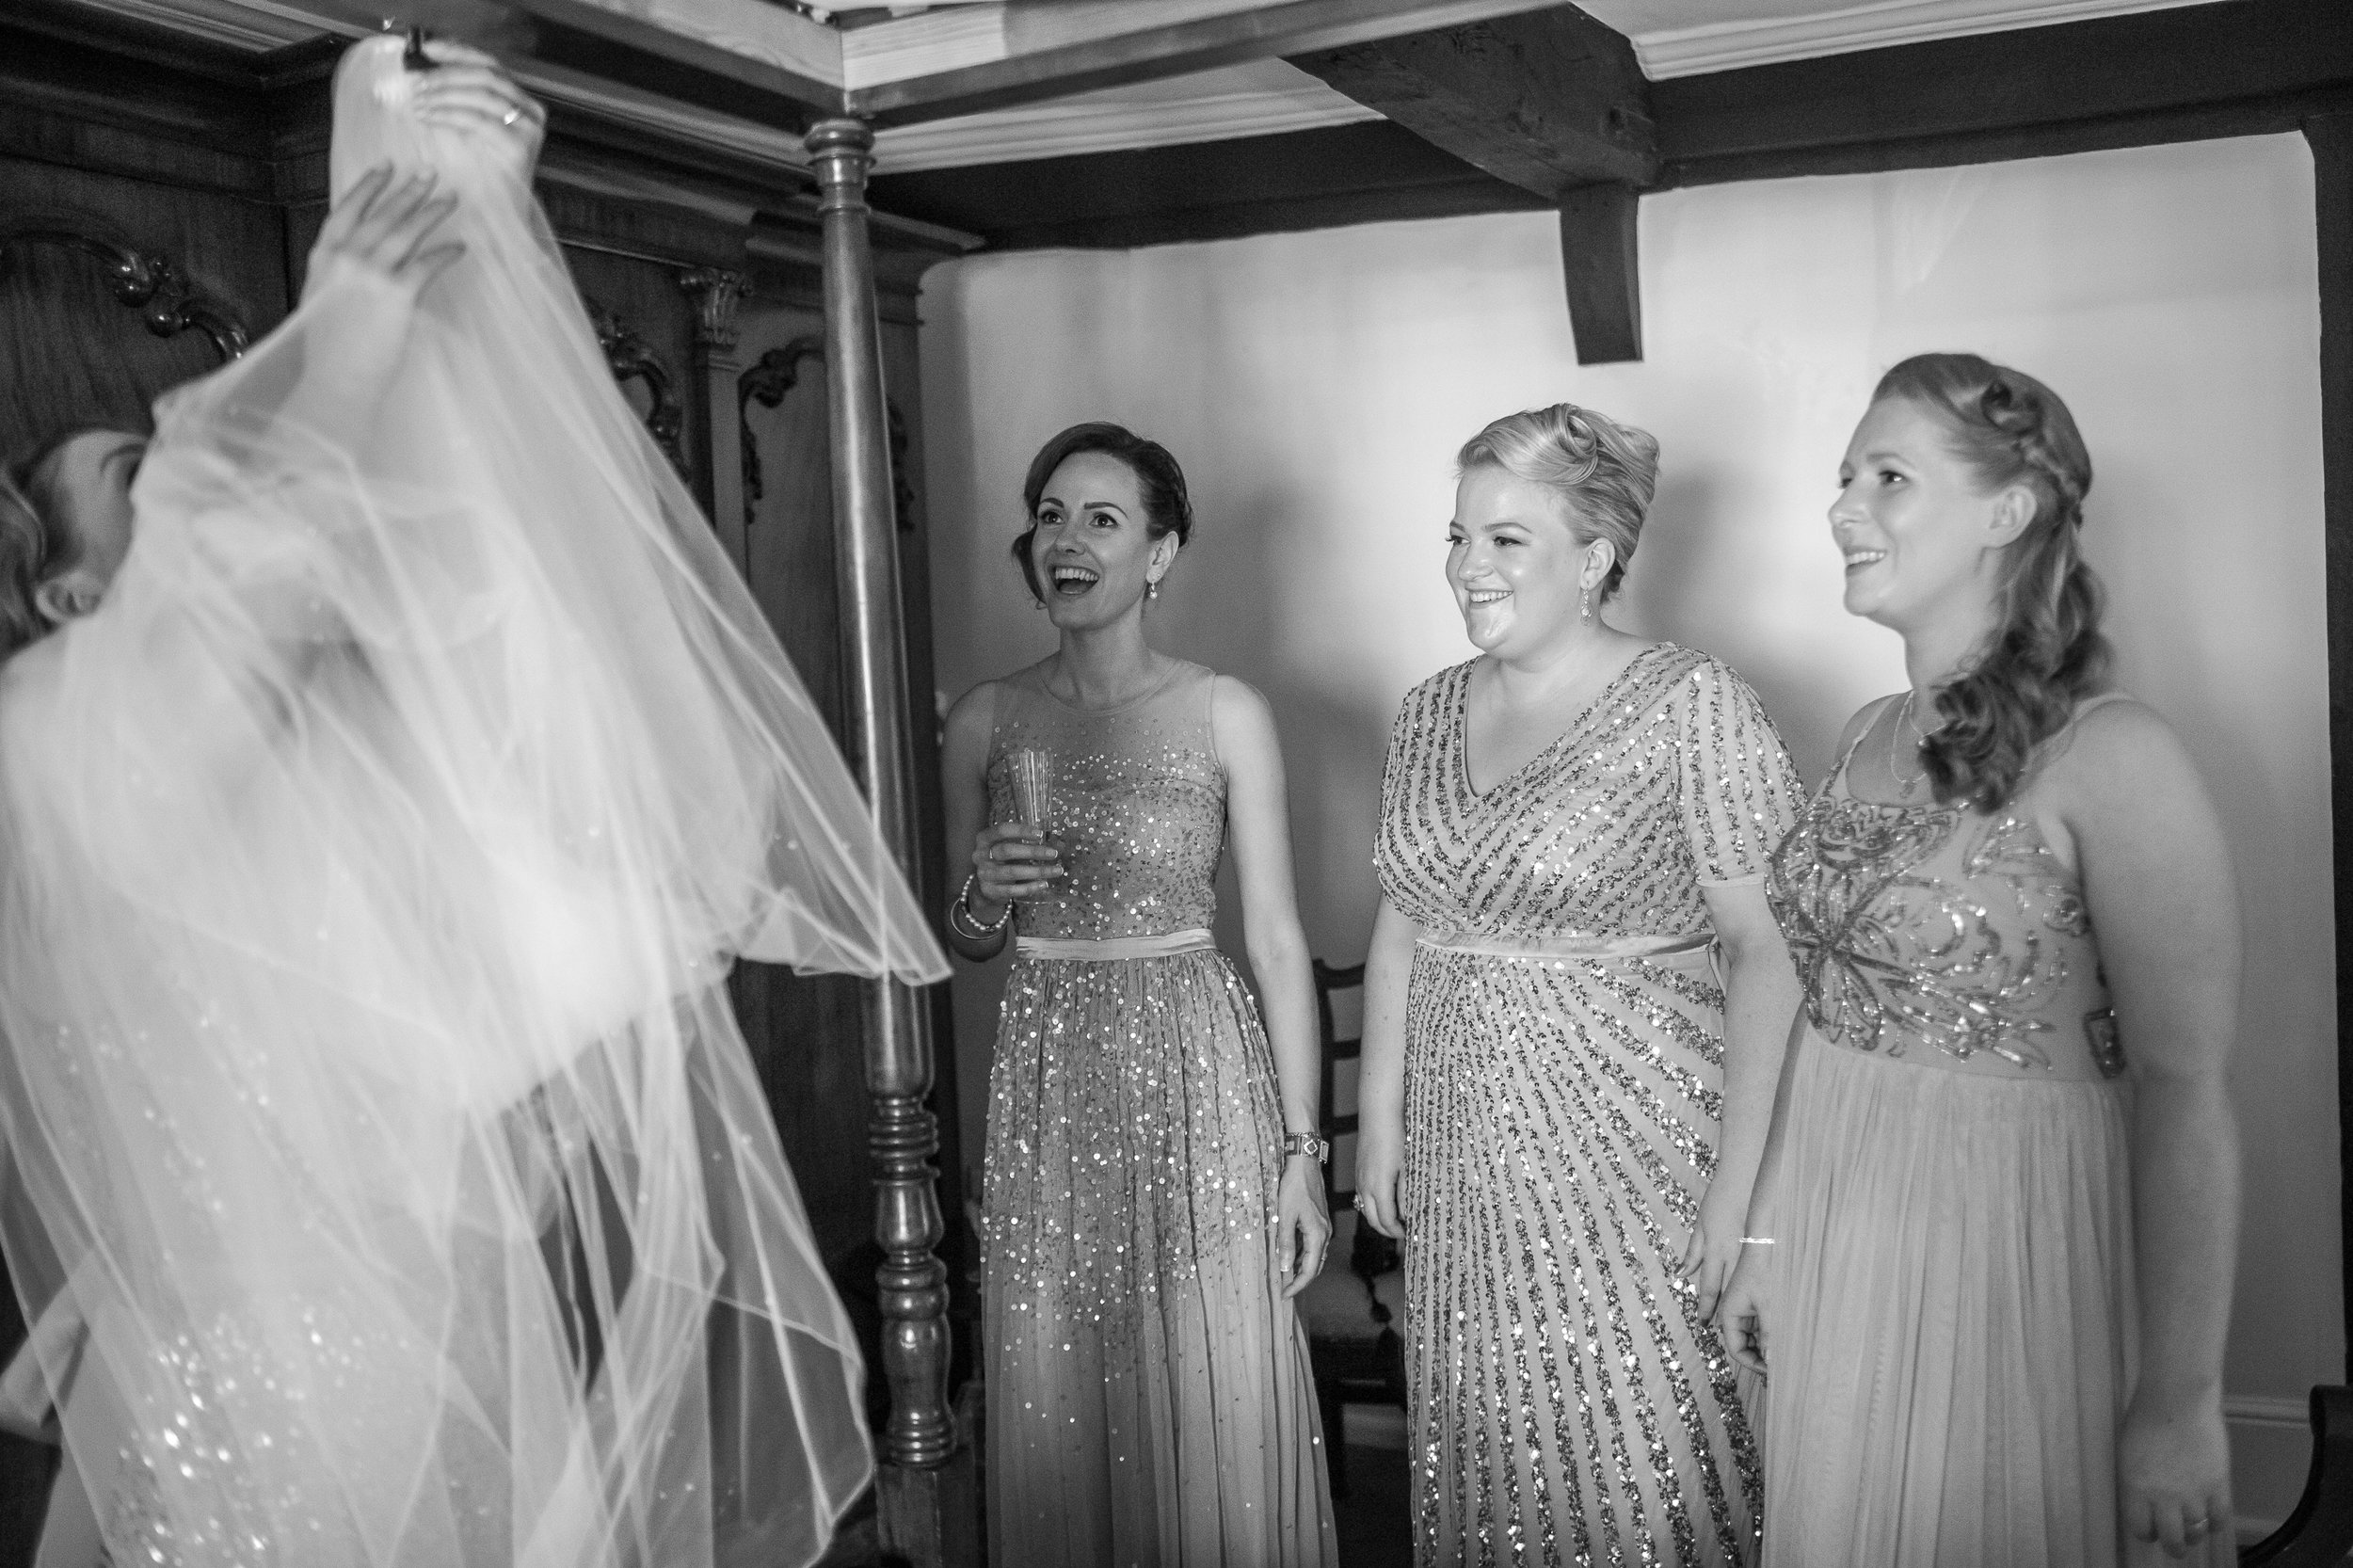 Grittenham Barn female wedding photographers west sussex petworth social-8.jpg